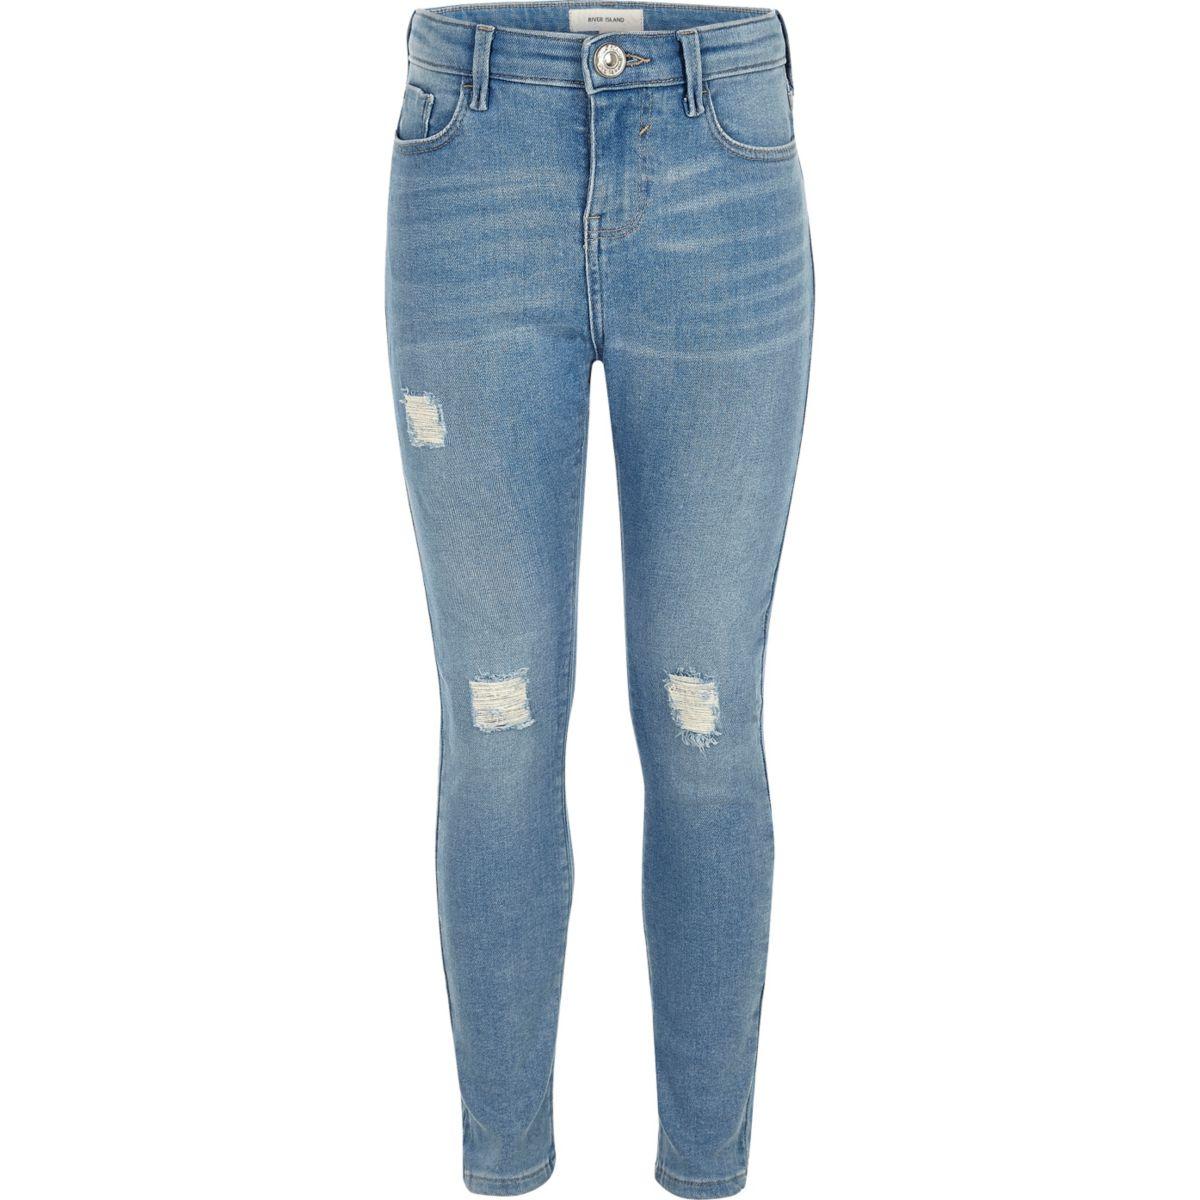 Girls light blue Amelie skinny jeans